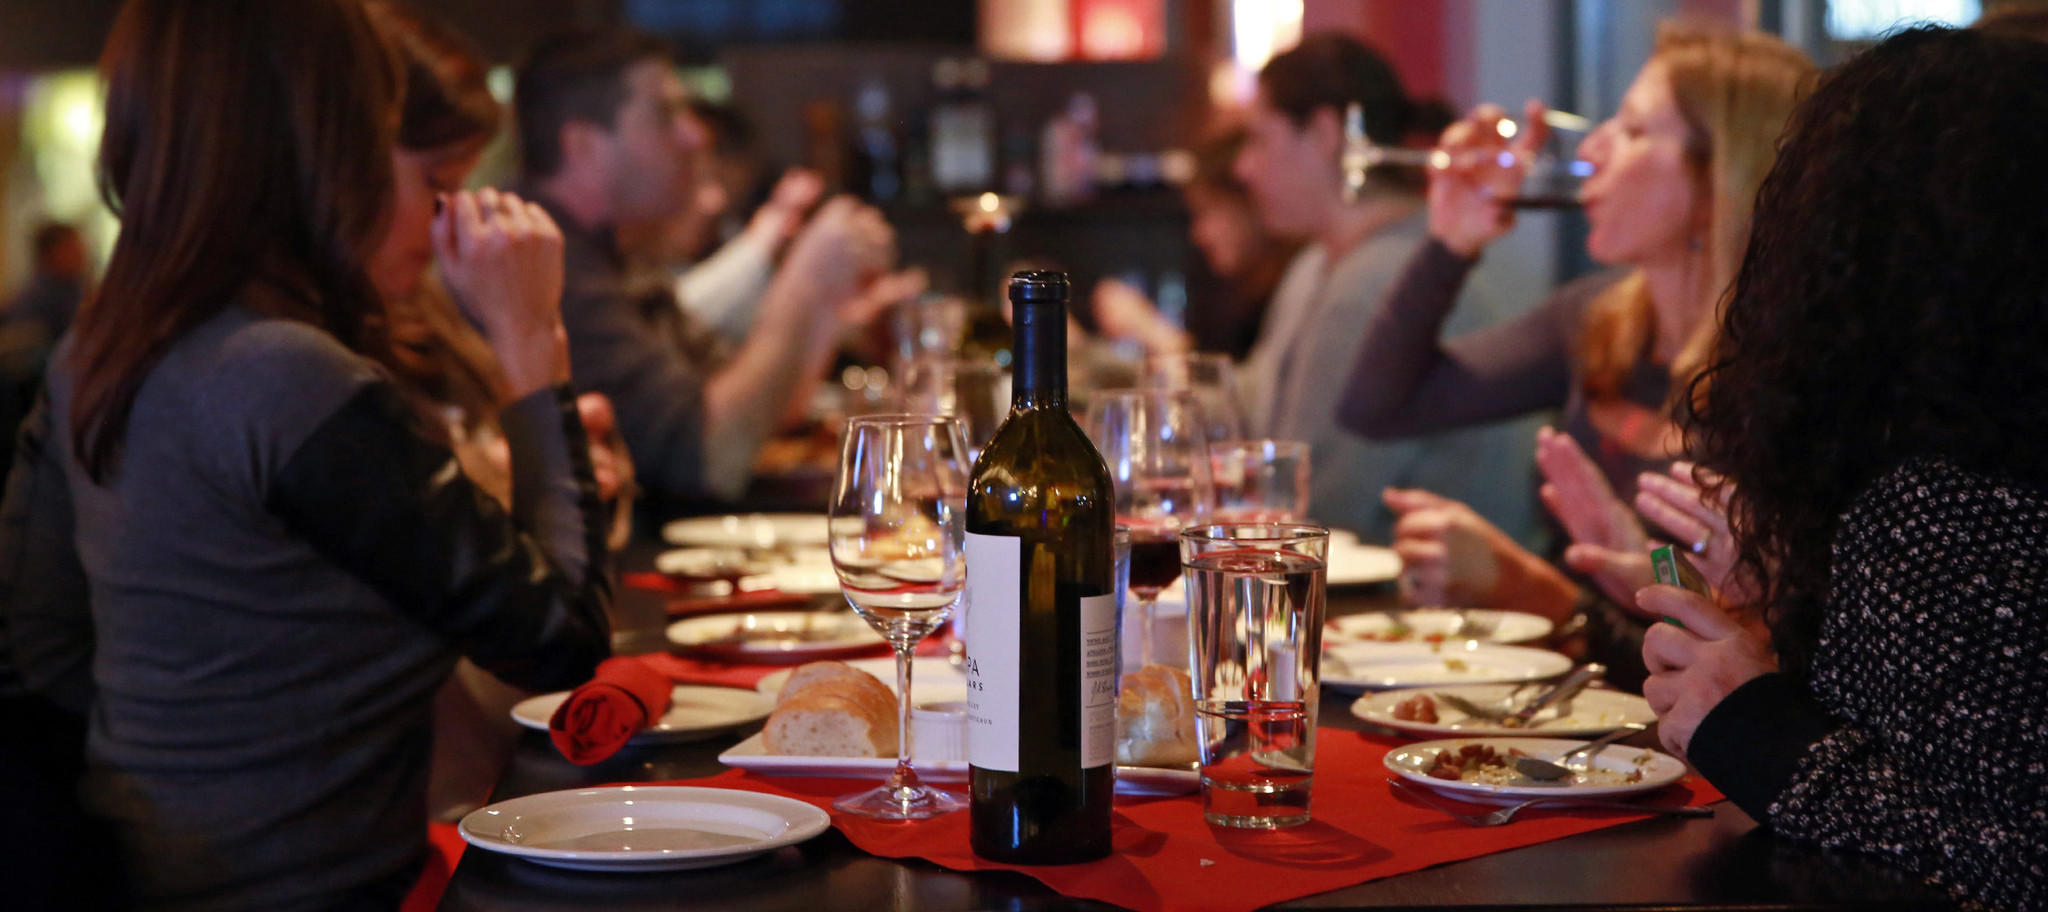 Restaurant owner Bobby Arifi said he uncorks 60 to 80 BYOB bottles a week